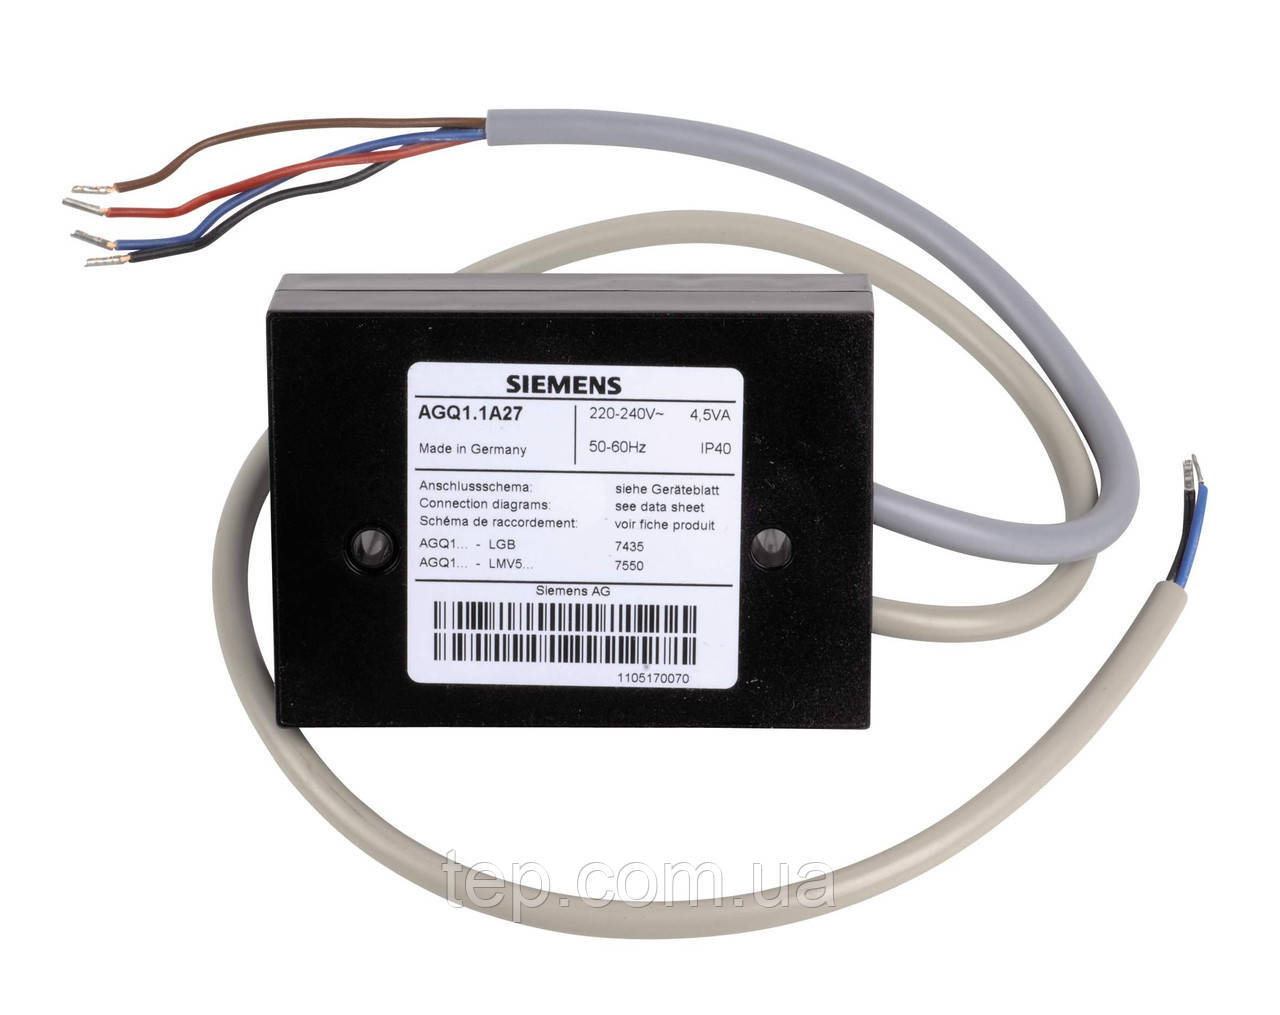 Підсилювач датчика Siemens AGQ1.2A27